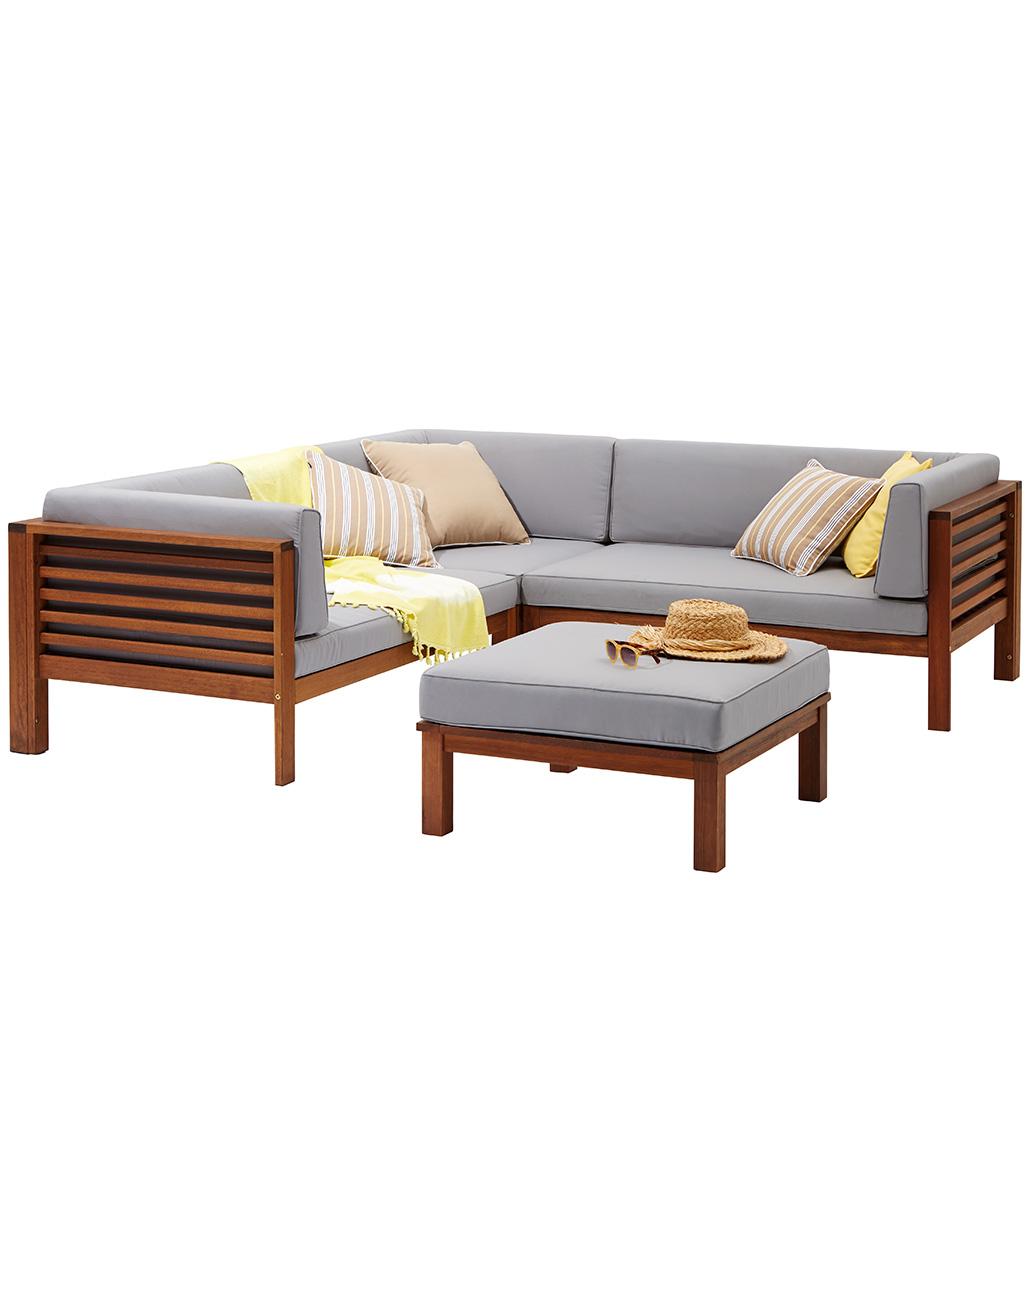 Teak Sofa Set Teak Wood Sofa Set Teak Sofa In Klang